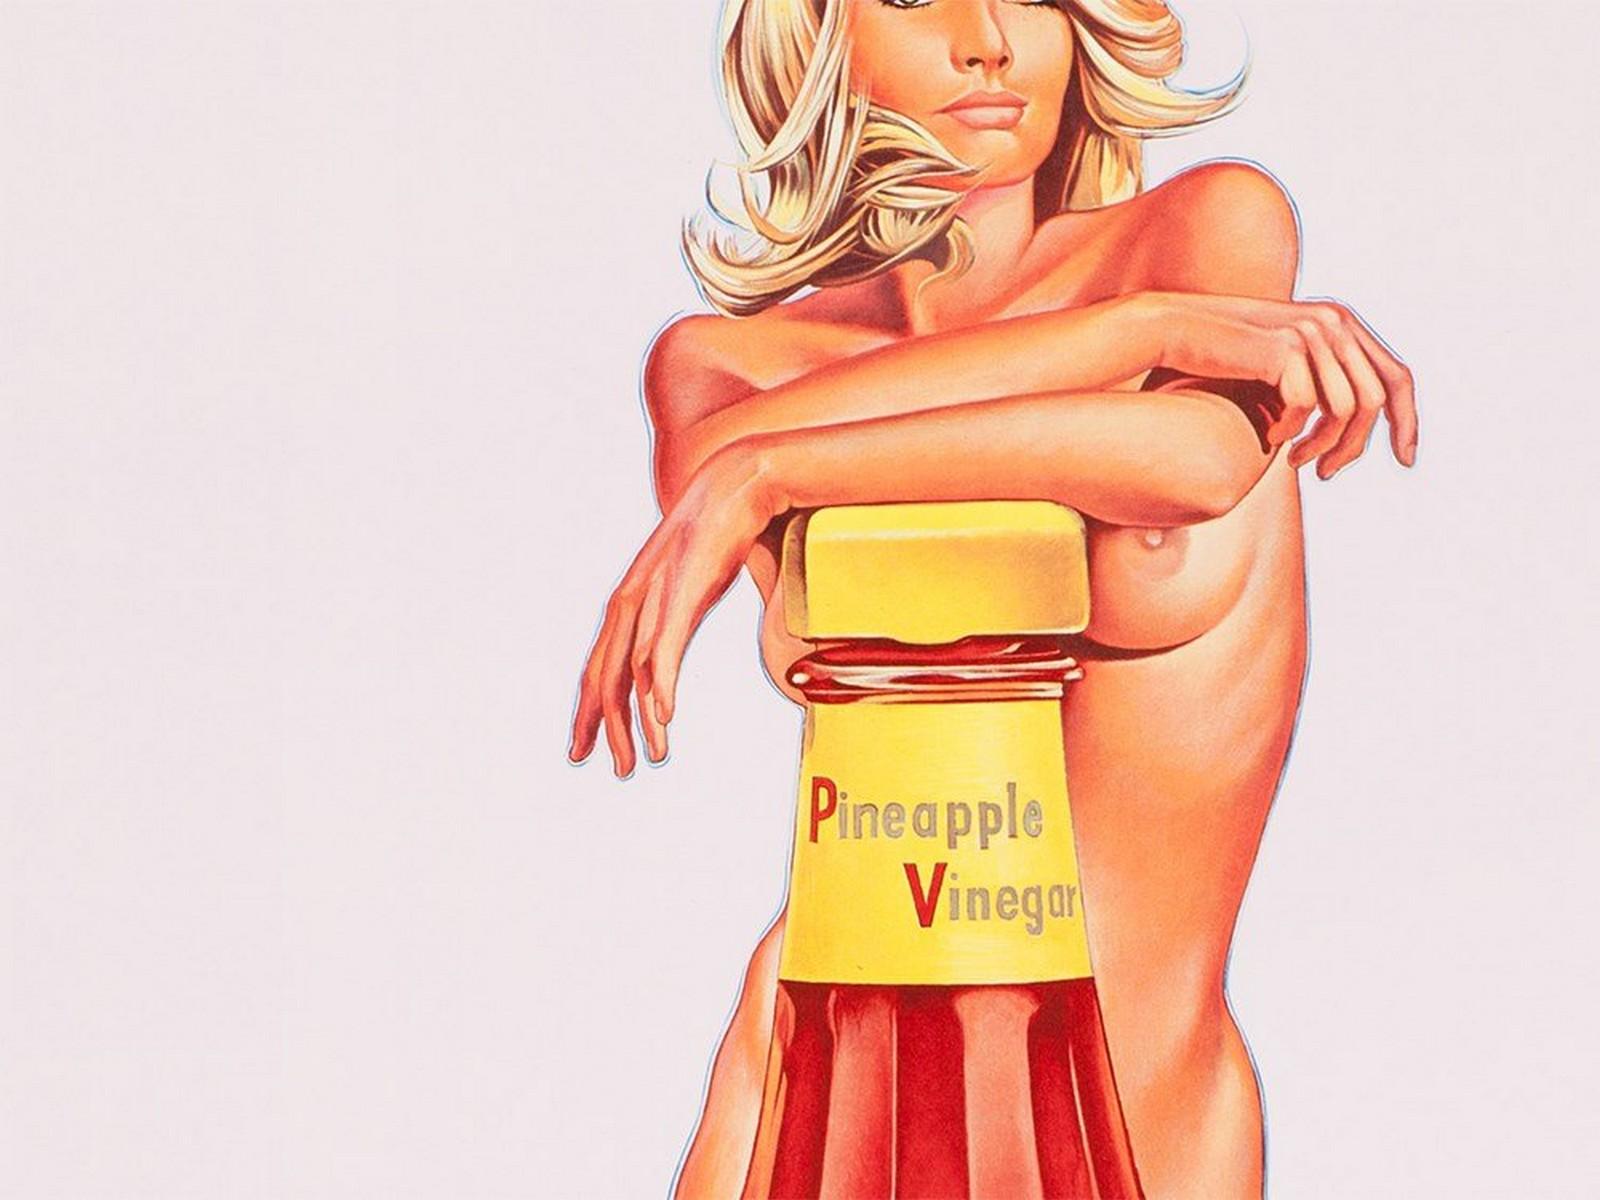 1973, silkscreen, A.P., 64 x 80 cm